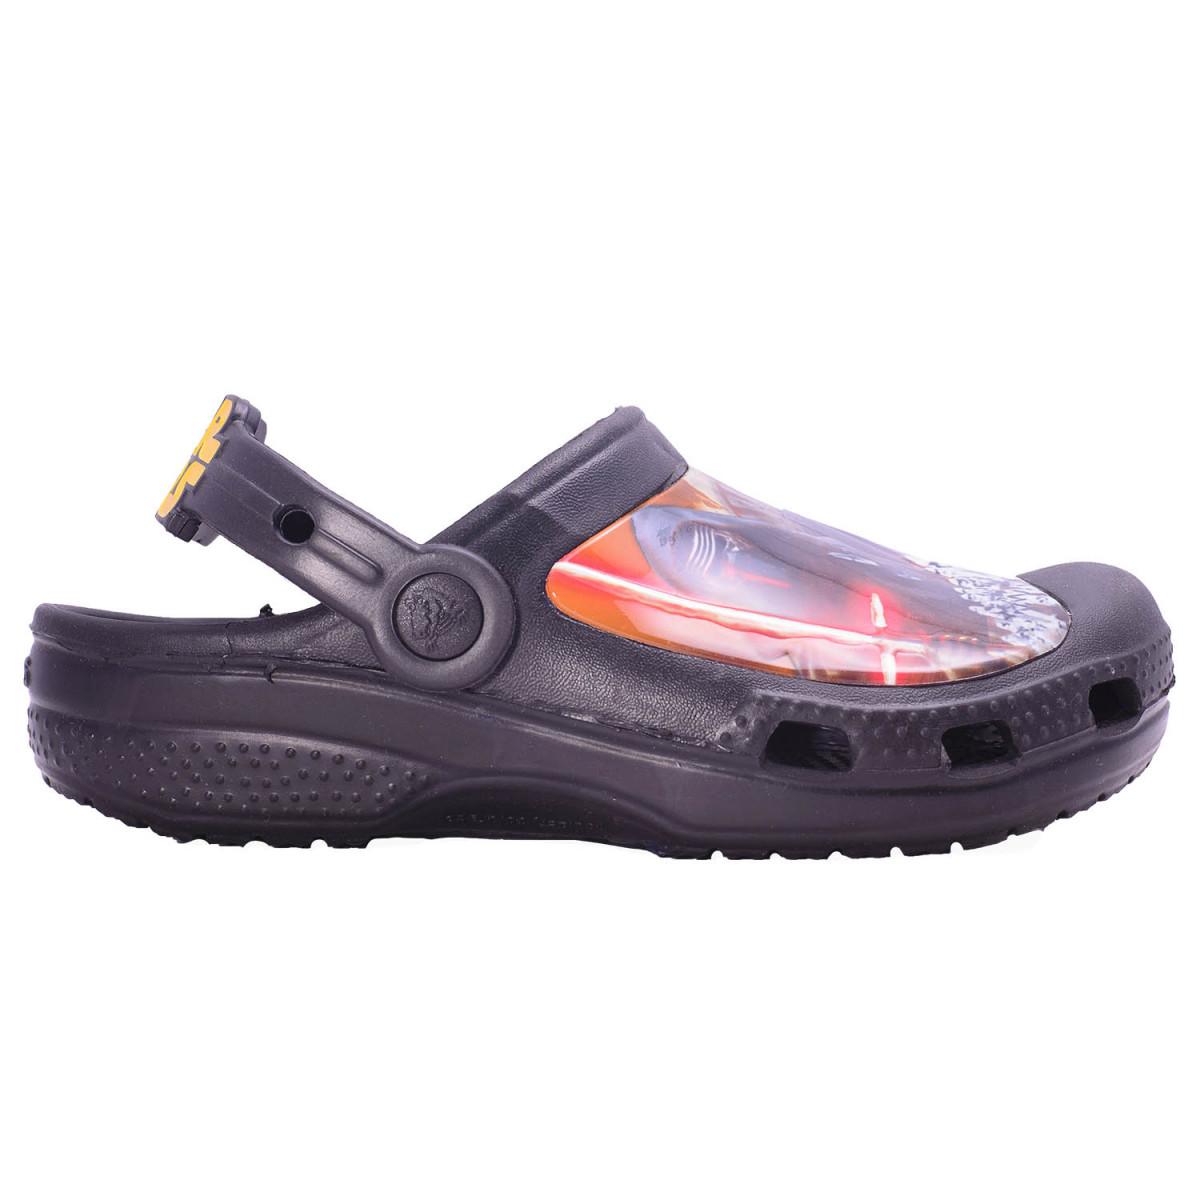 Zapatos lila Crocs infantiles 5SnwbXP